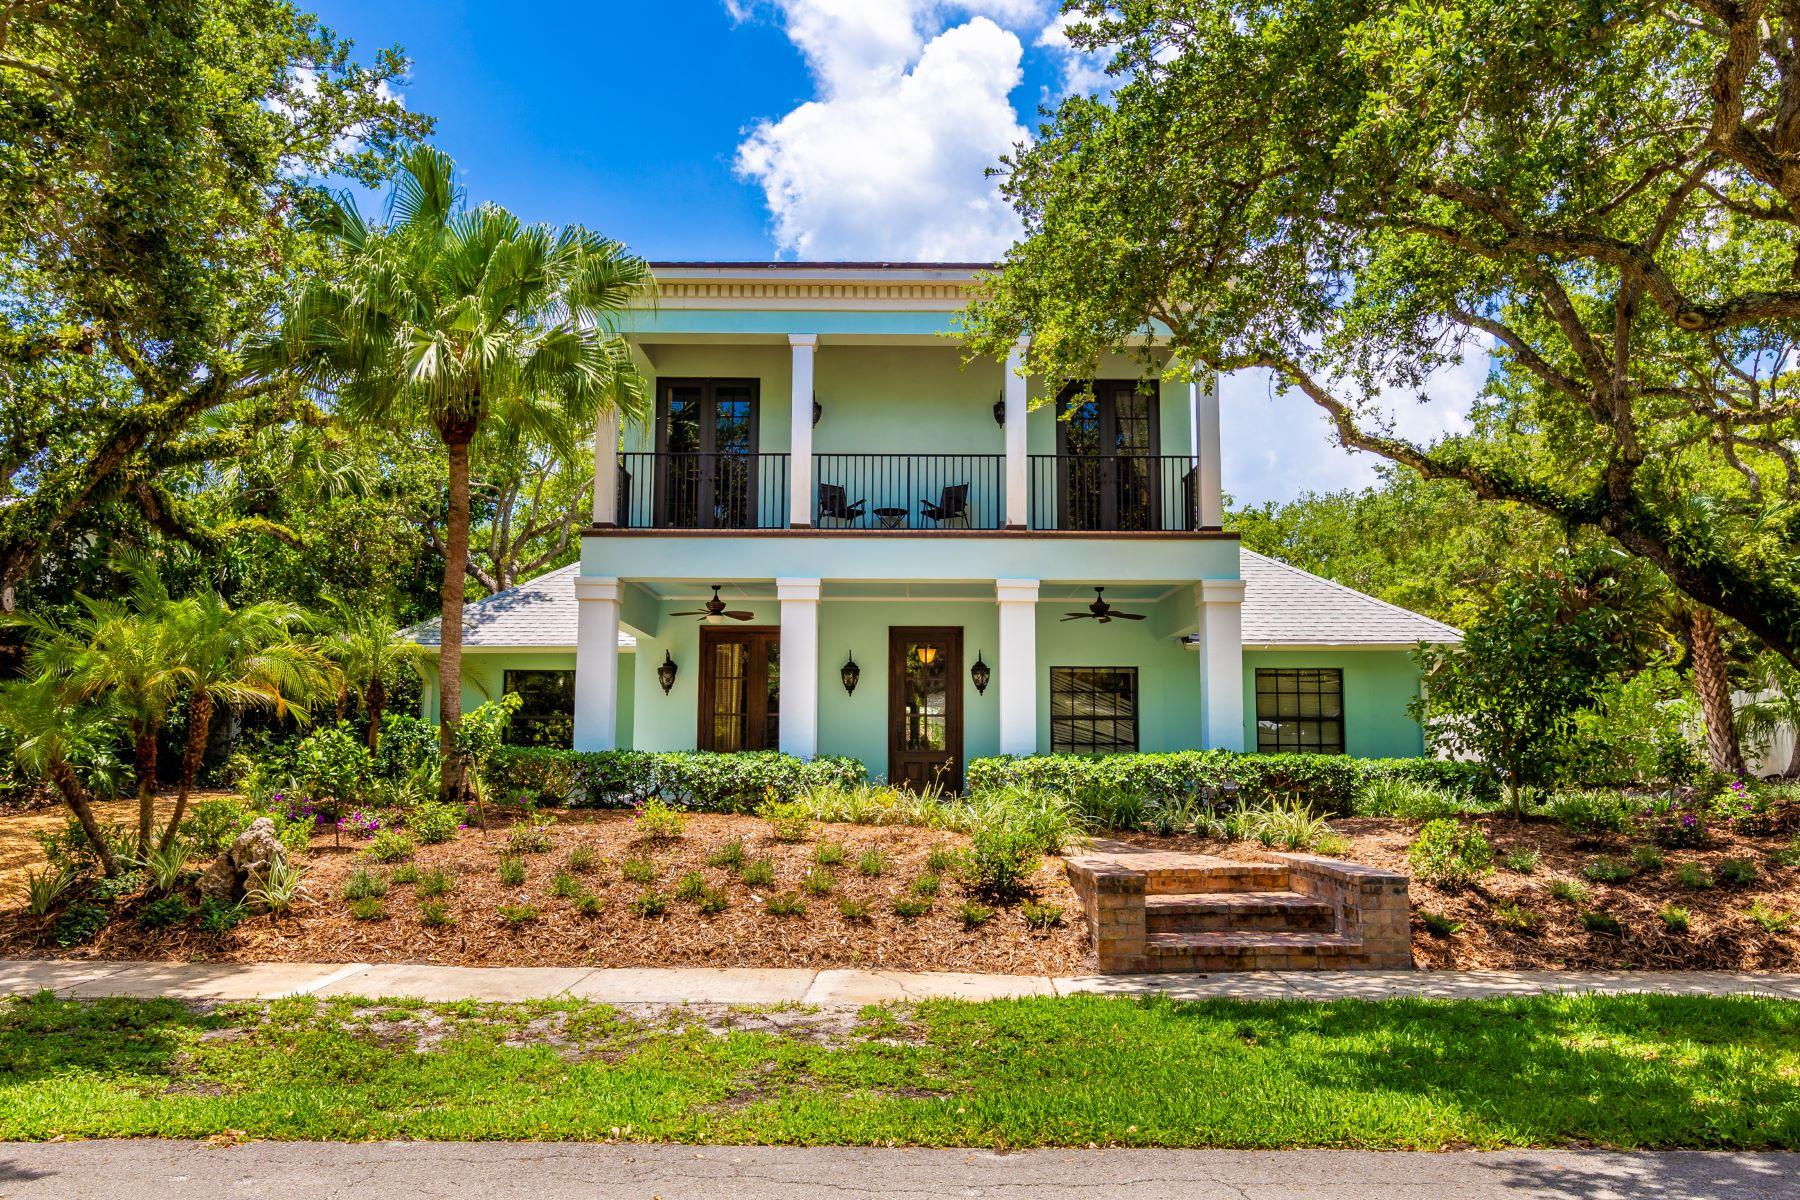 New Orleans Style Home 530 Camelia Lane NULL Vero Beach, Florida 32963 Vereinigte Staaten